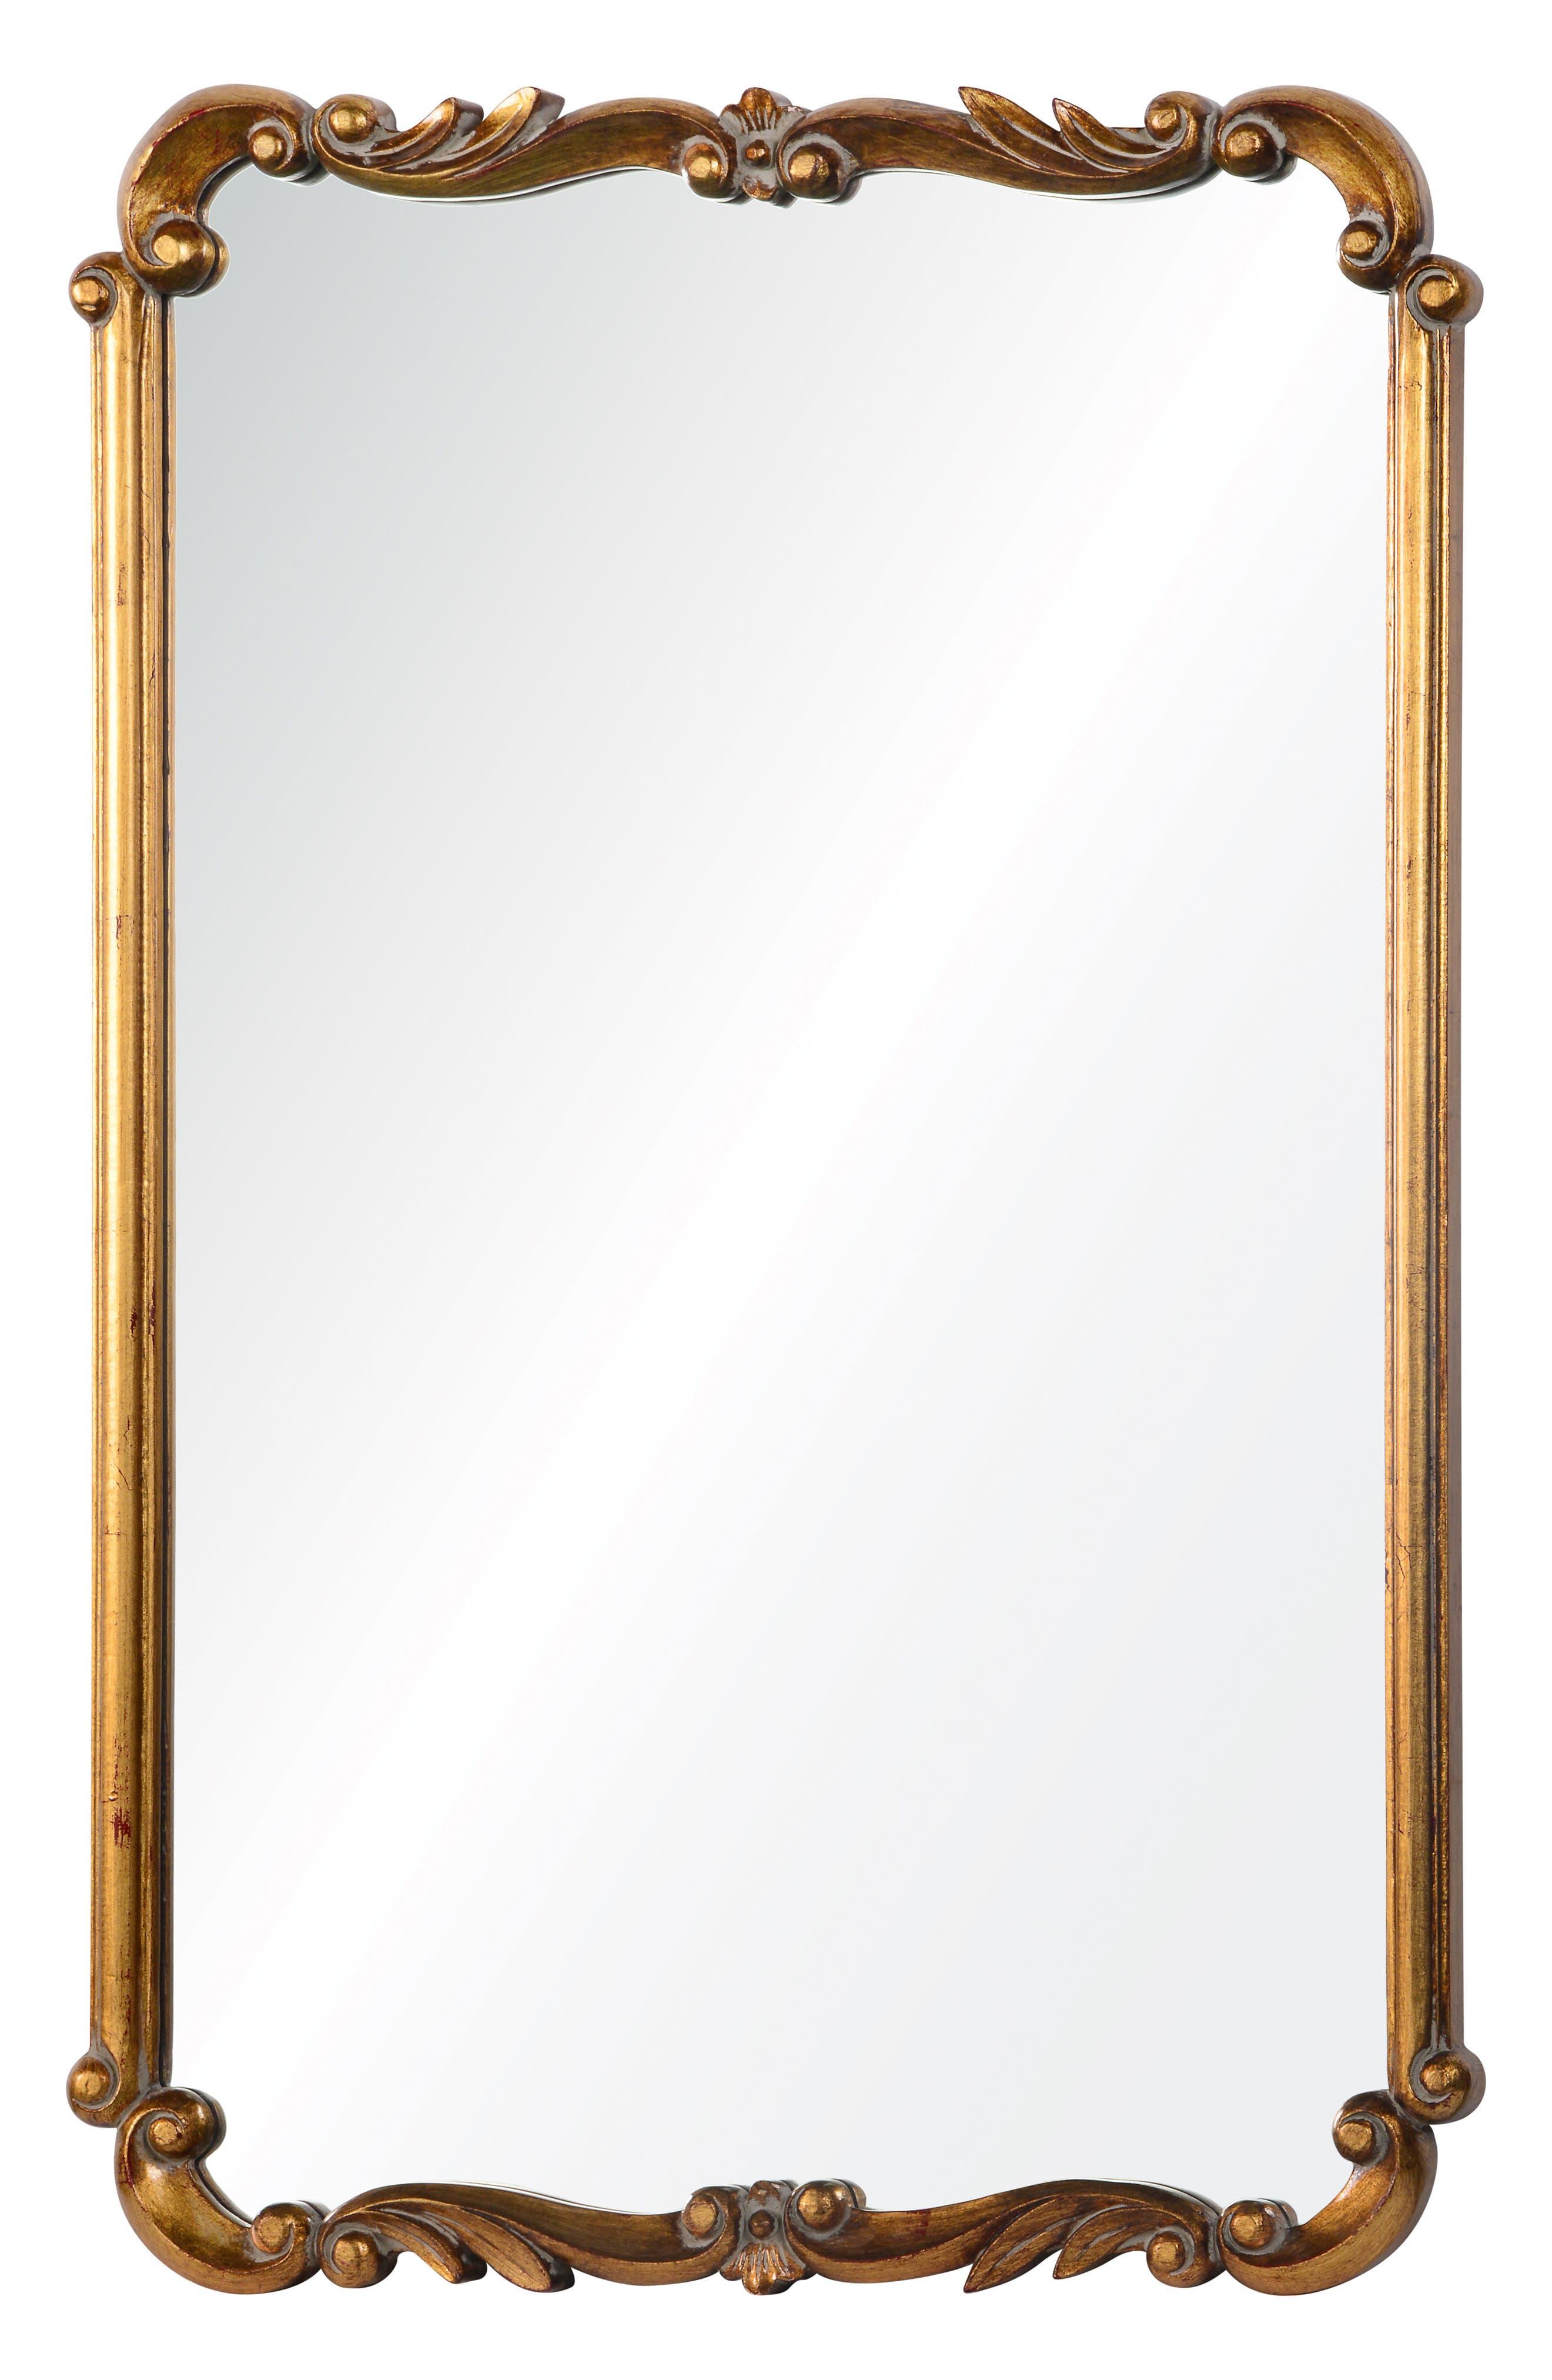 Antiqued Wall Mirror,                             Main thumbnail 1, color,                             METALLIC GOLD